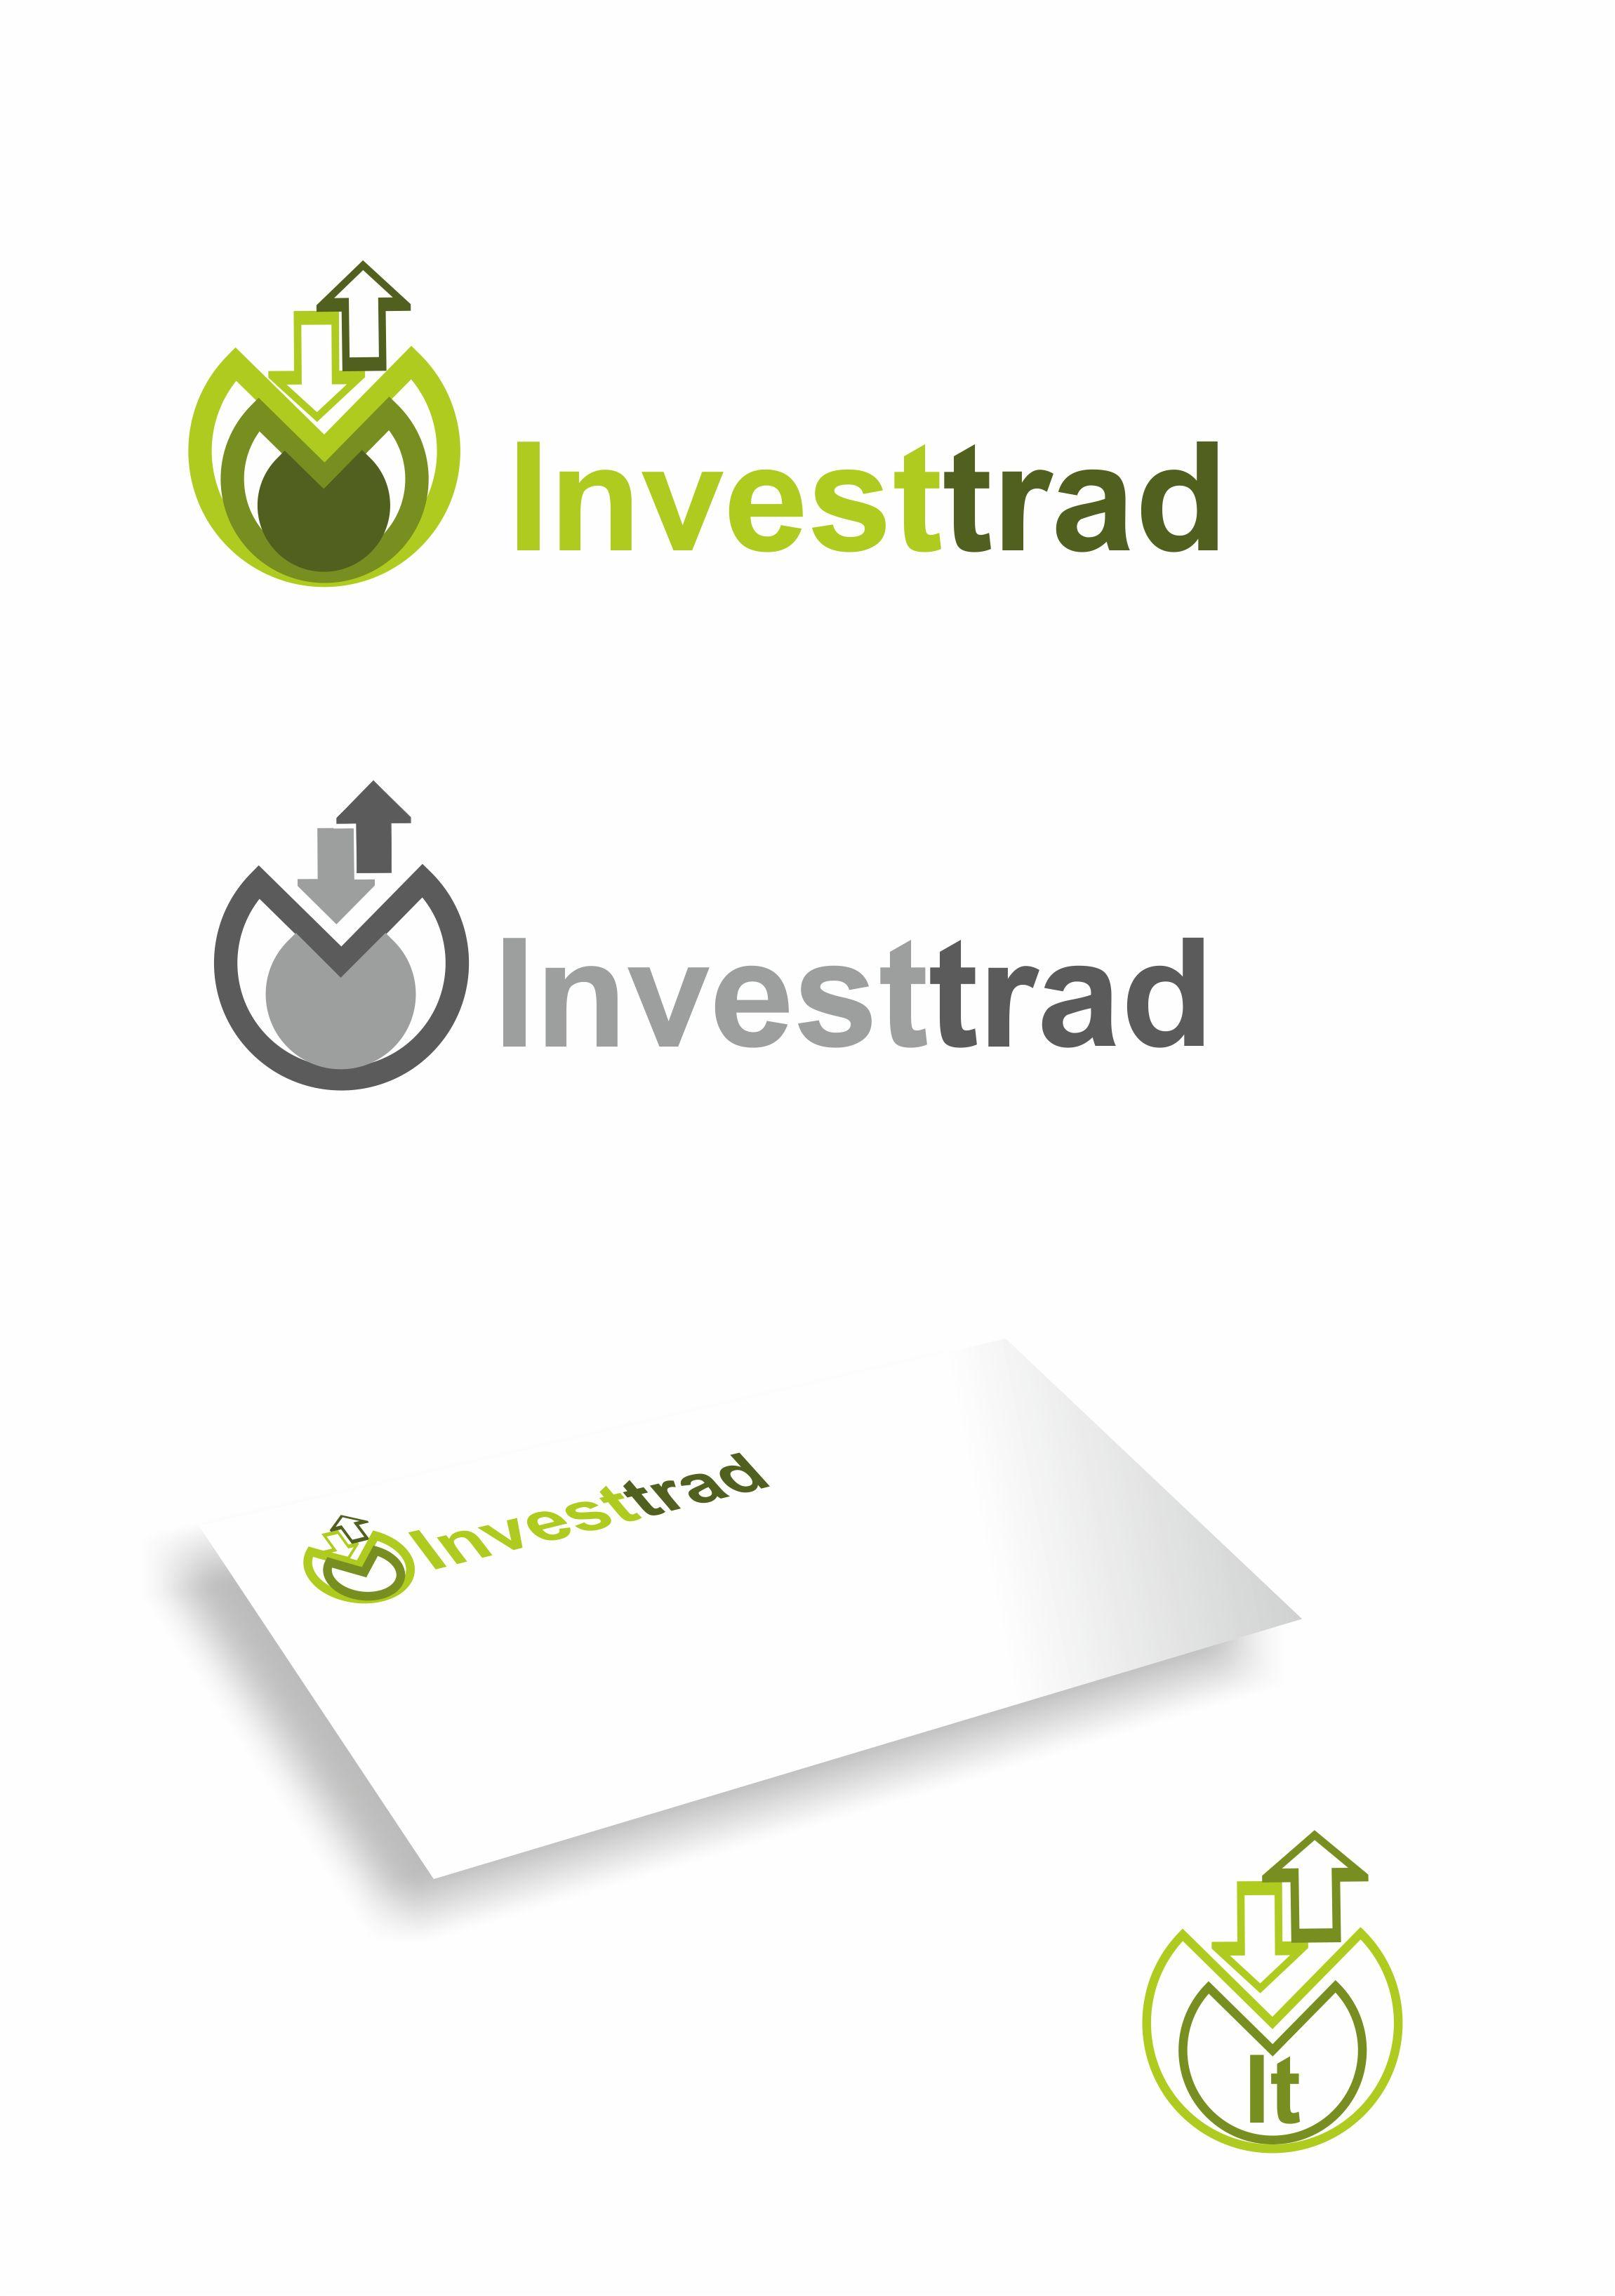 Разработка логотипа для компании Invest trade фото f_6405120ae94dac2e.jpg